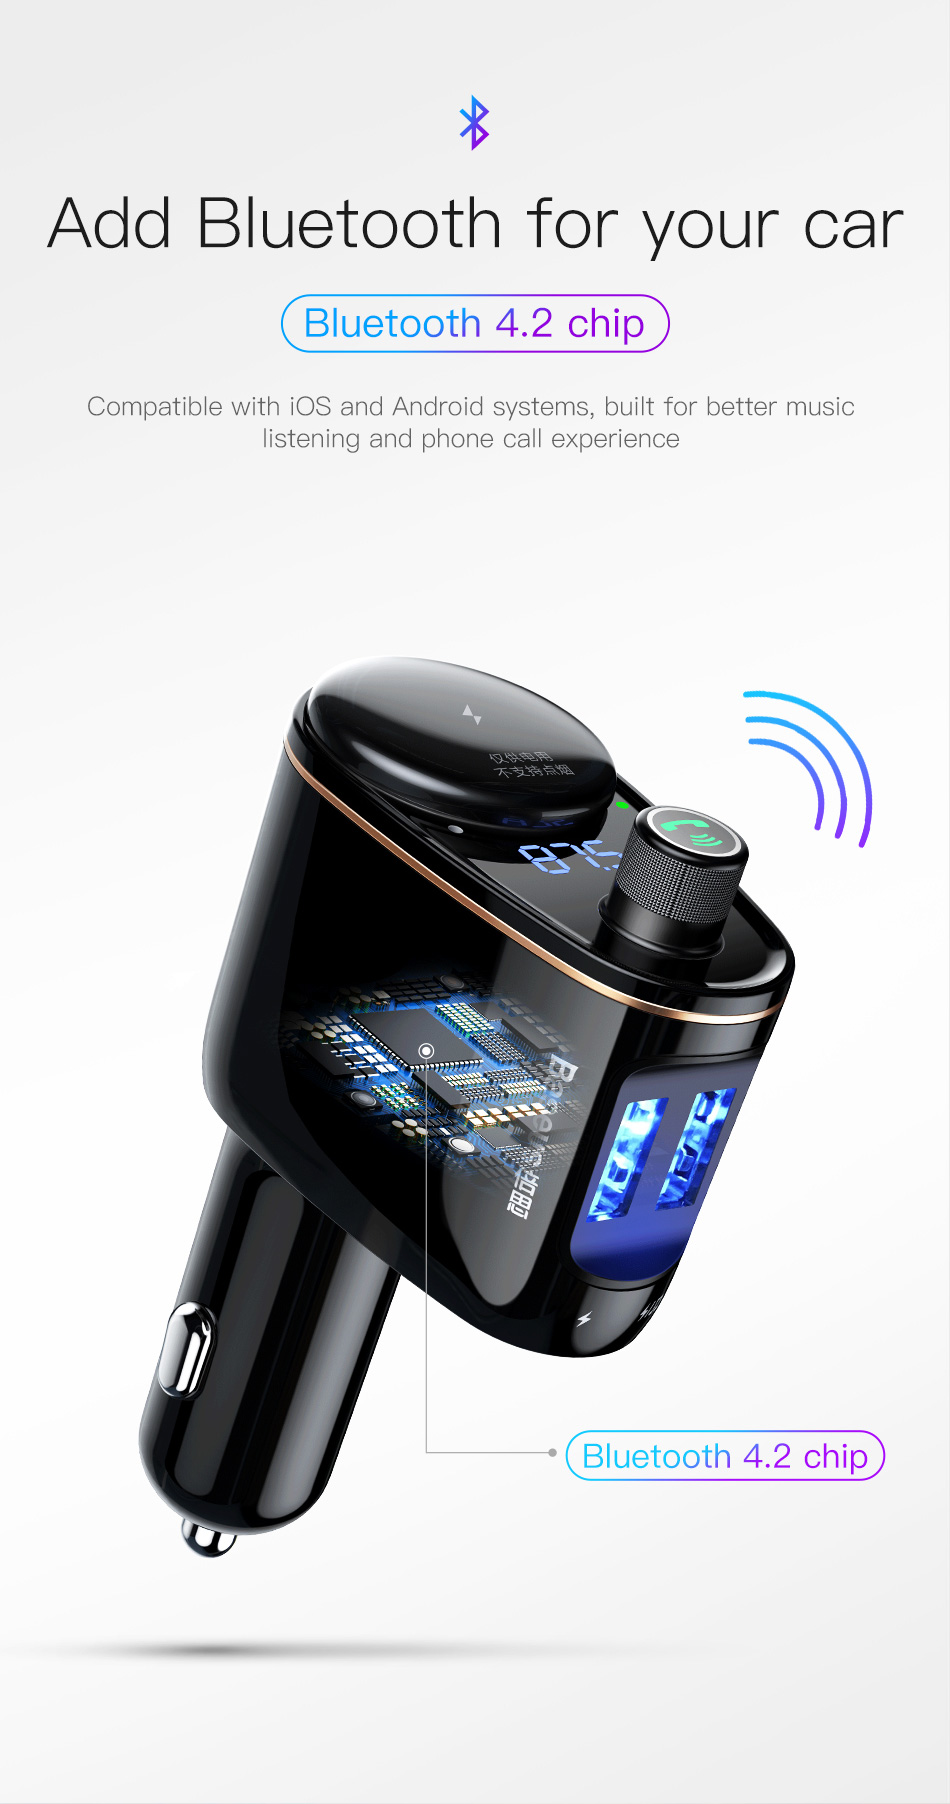 Baseus Car Mp3 Audio Player Bluetooth Kit Fm Transmitter Single Chip For Short Range Application 0 01 Htb1lsbrhrznbknjszfrq6yrlfxai 02